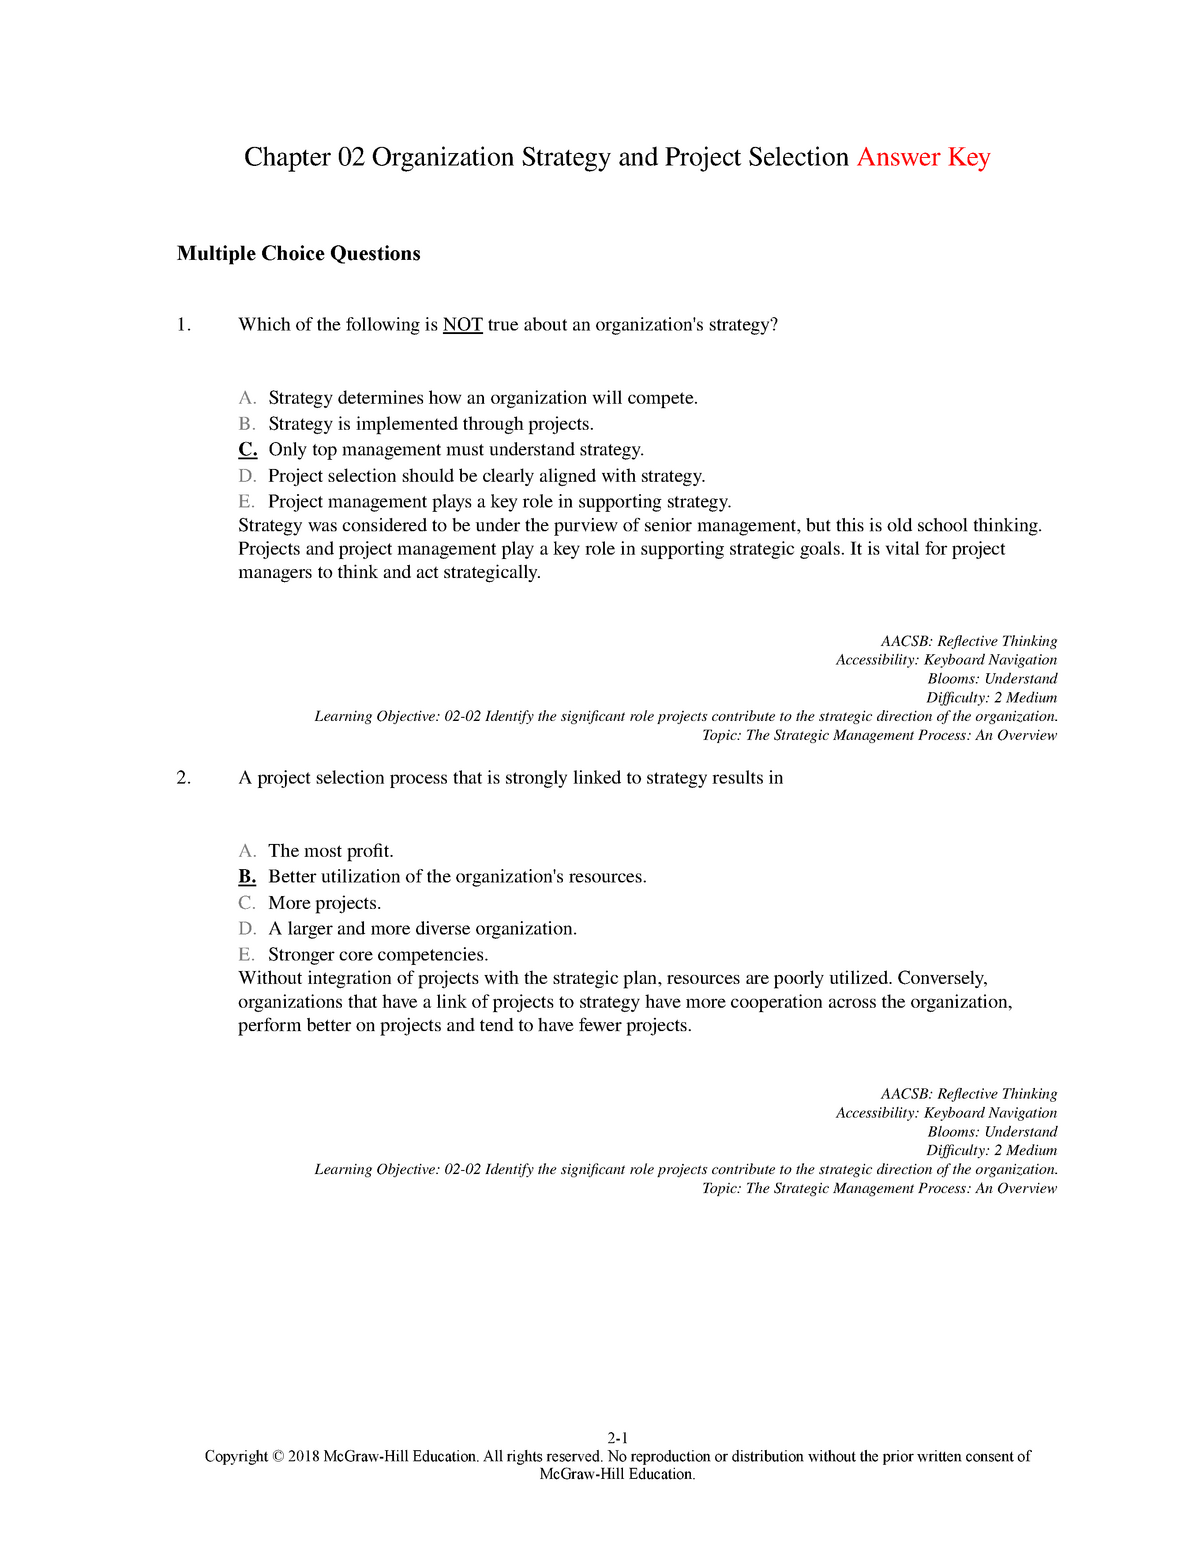 Examen 2019 - BUSS 5142: Principles of Project Management - StuDocu